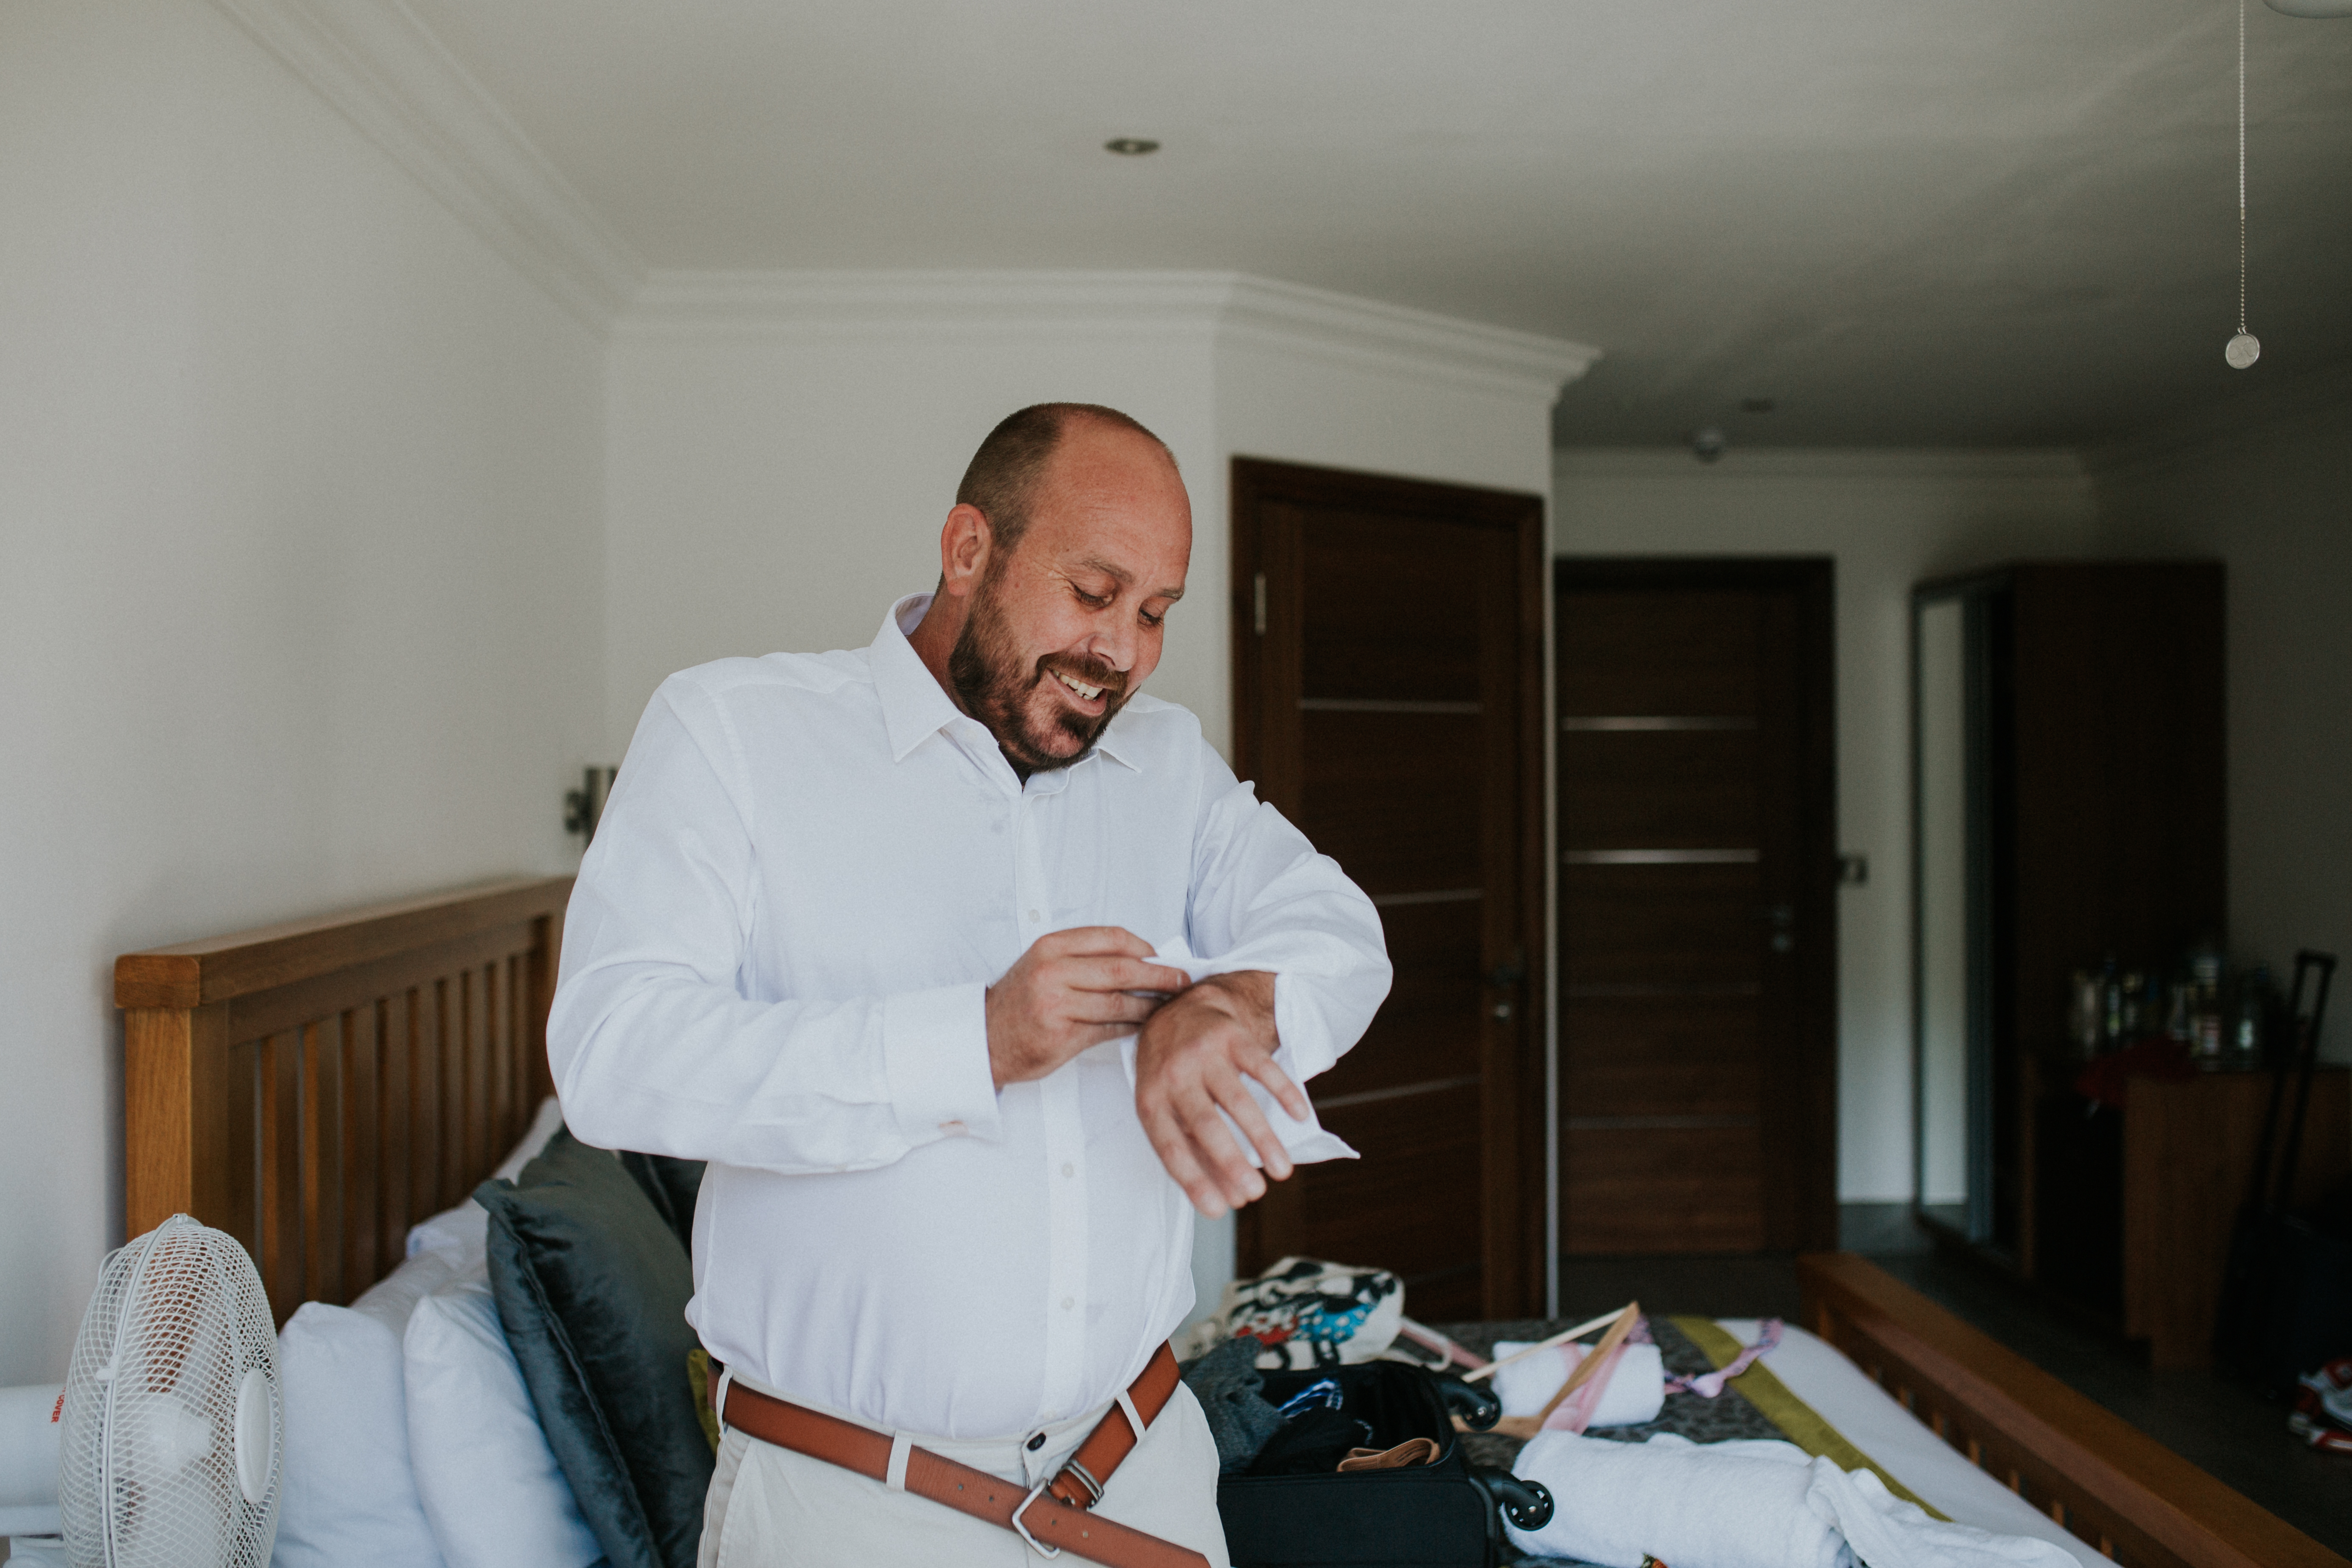 groom doing cufflinks